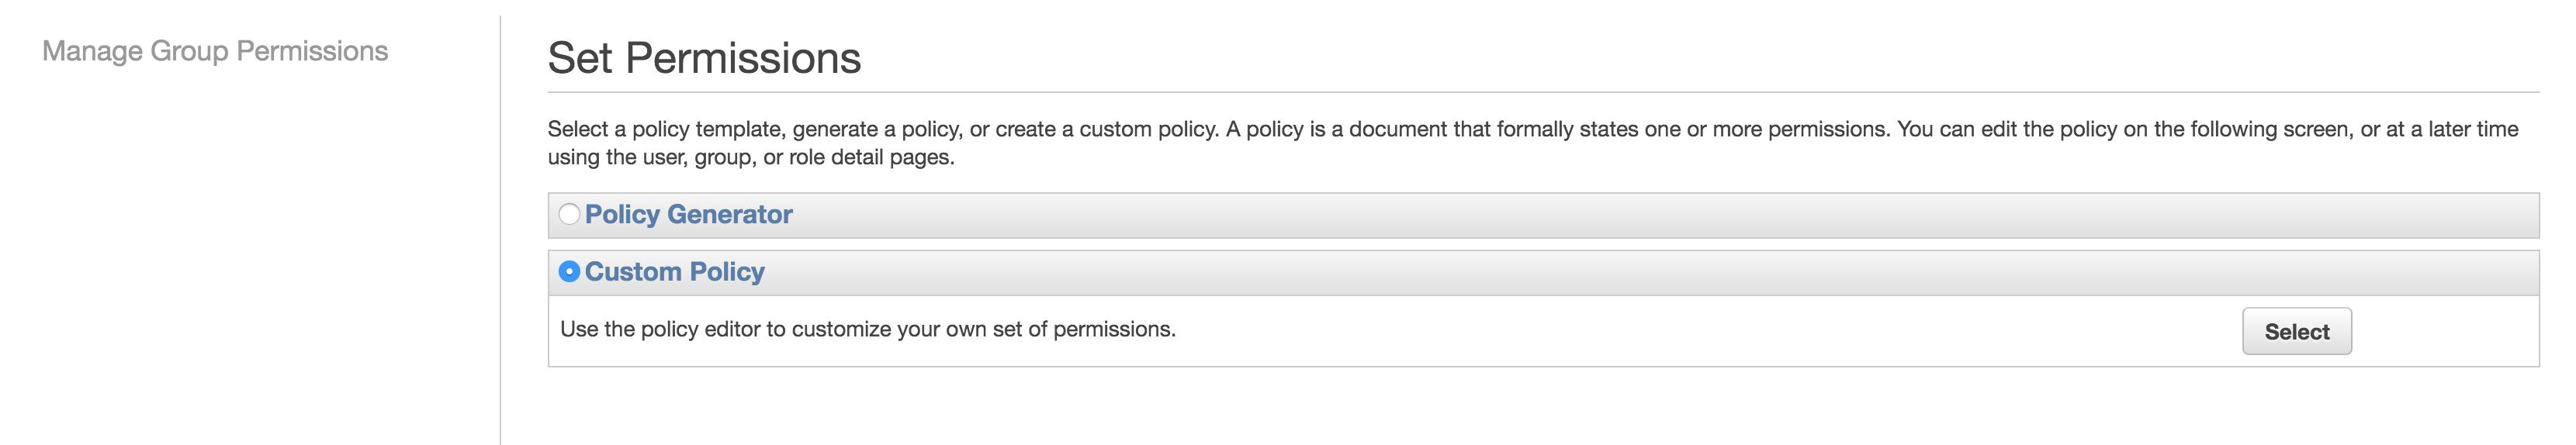 custom policy